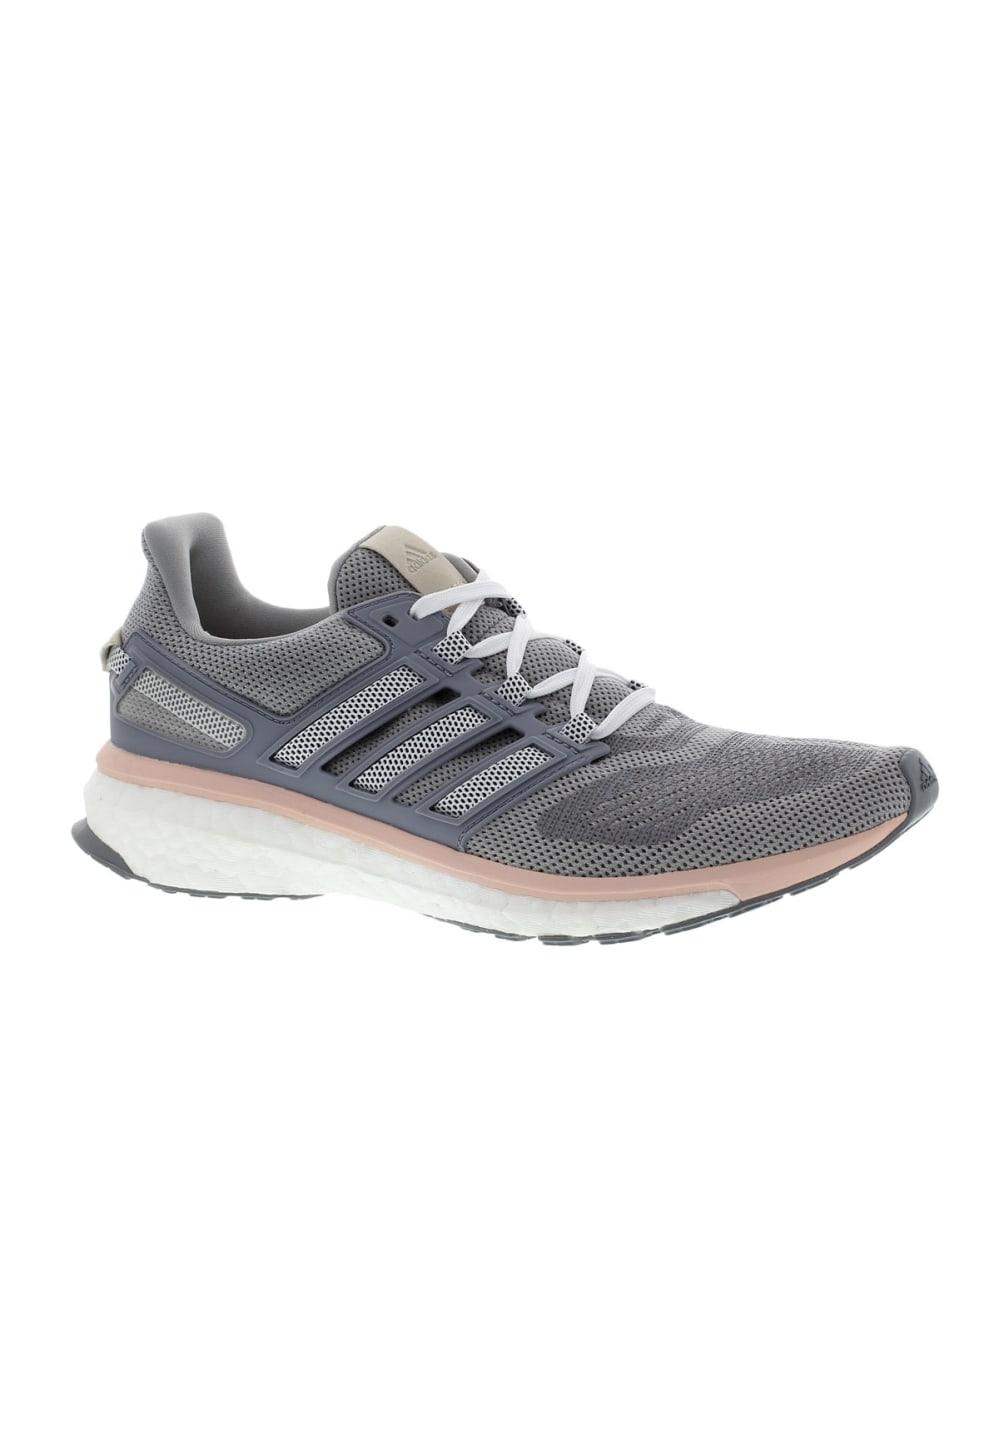 adidas Energy Boost 3 - Laufschuhe für Damen - Grau